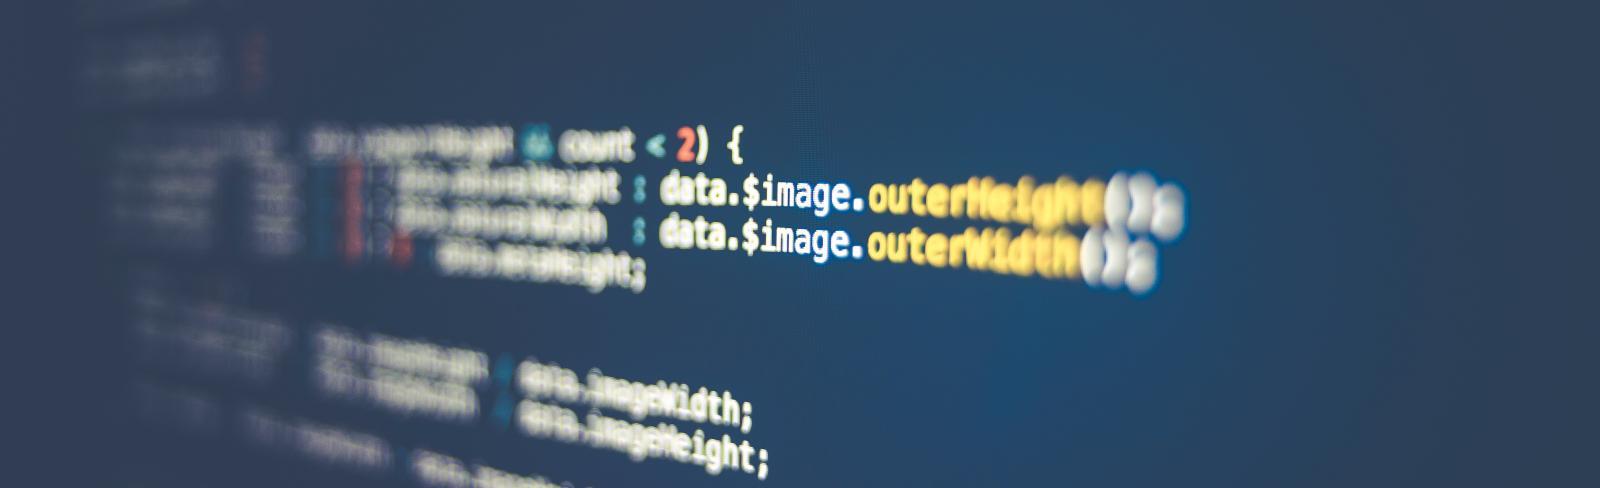 Computer code. Photo by Markus Spiske via Unsplash